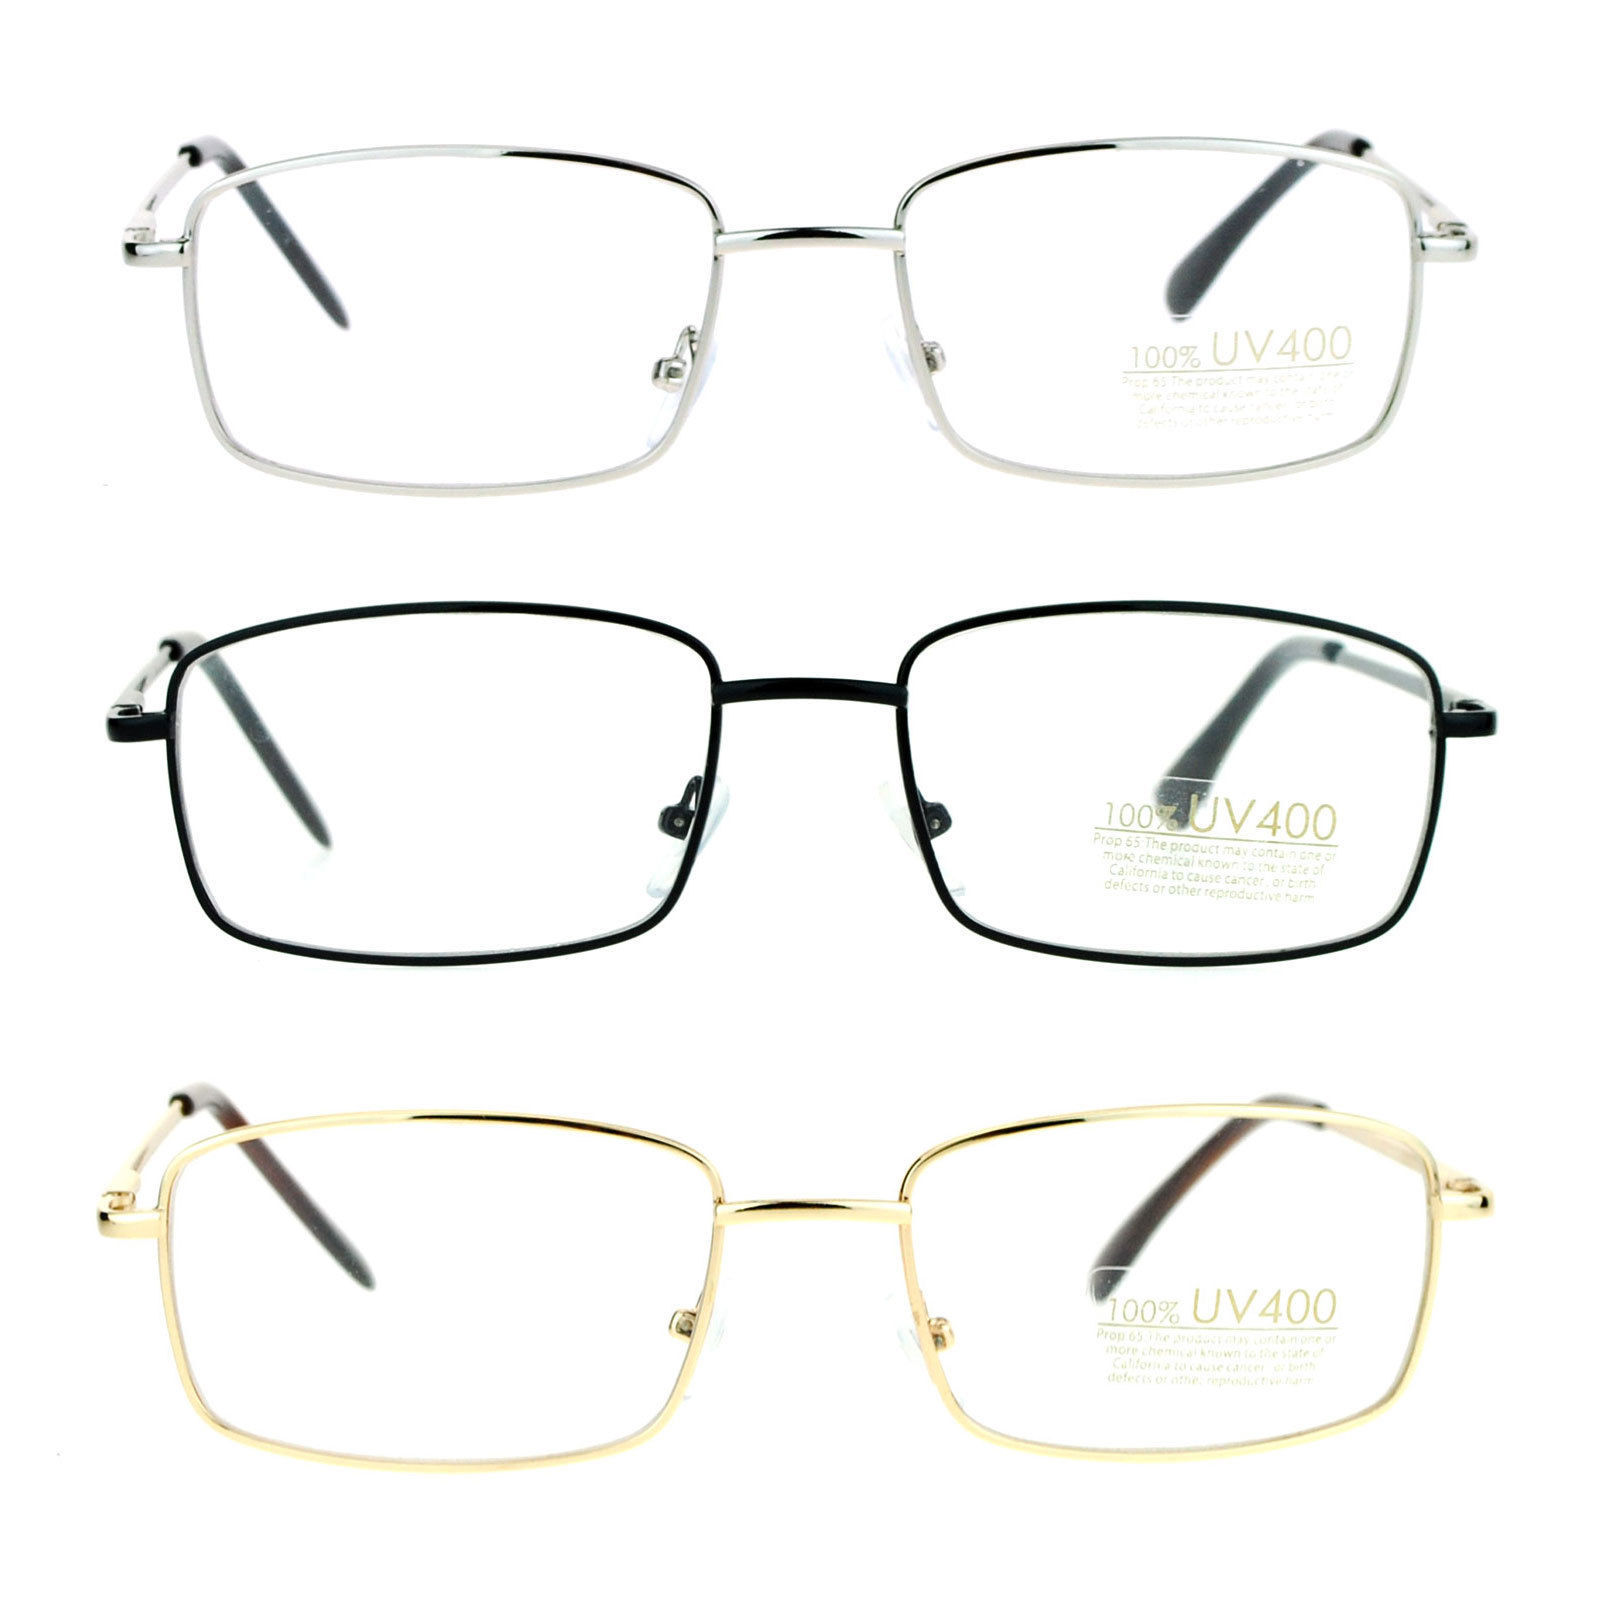 7579962665c1 S l1600. S l1600. Previous. SA106 Mens Snug Minimal Narrow Rectangular  Metal Rim Eyeglasses. SA106 Mens Snug Minimal Narrow ...